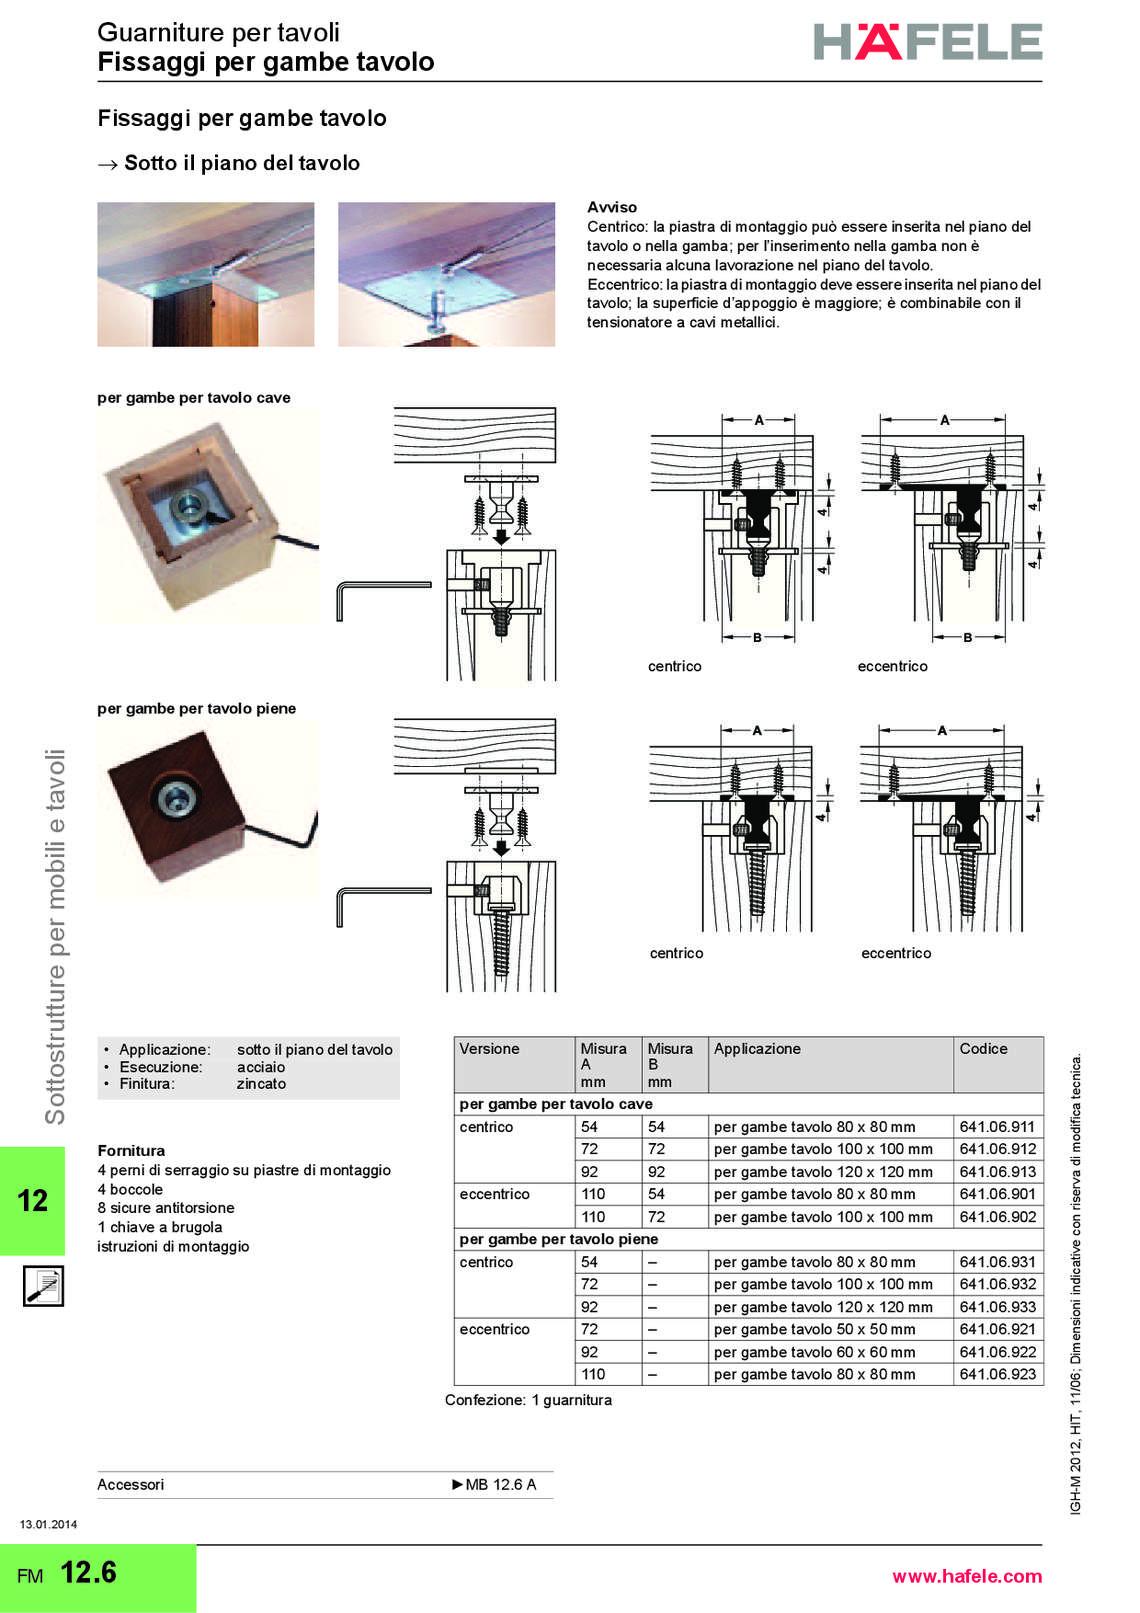 hafele-sottostrutture-per-mobili_83_015.jpg